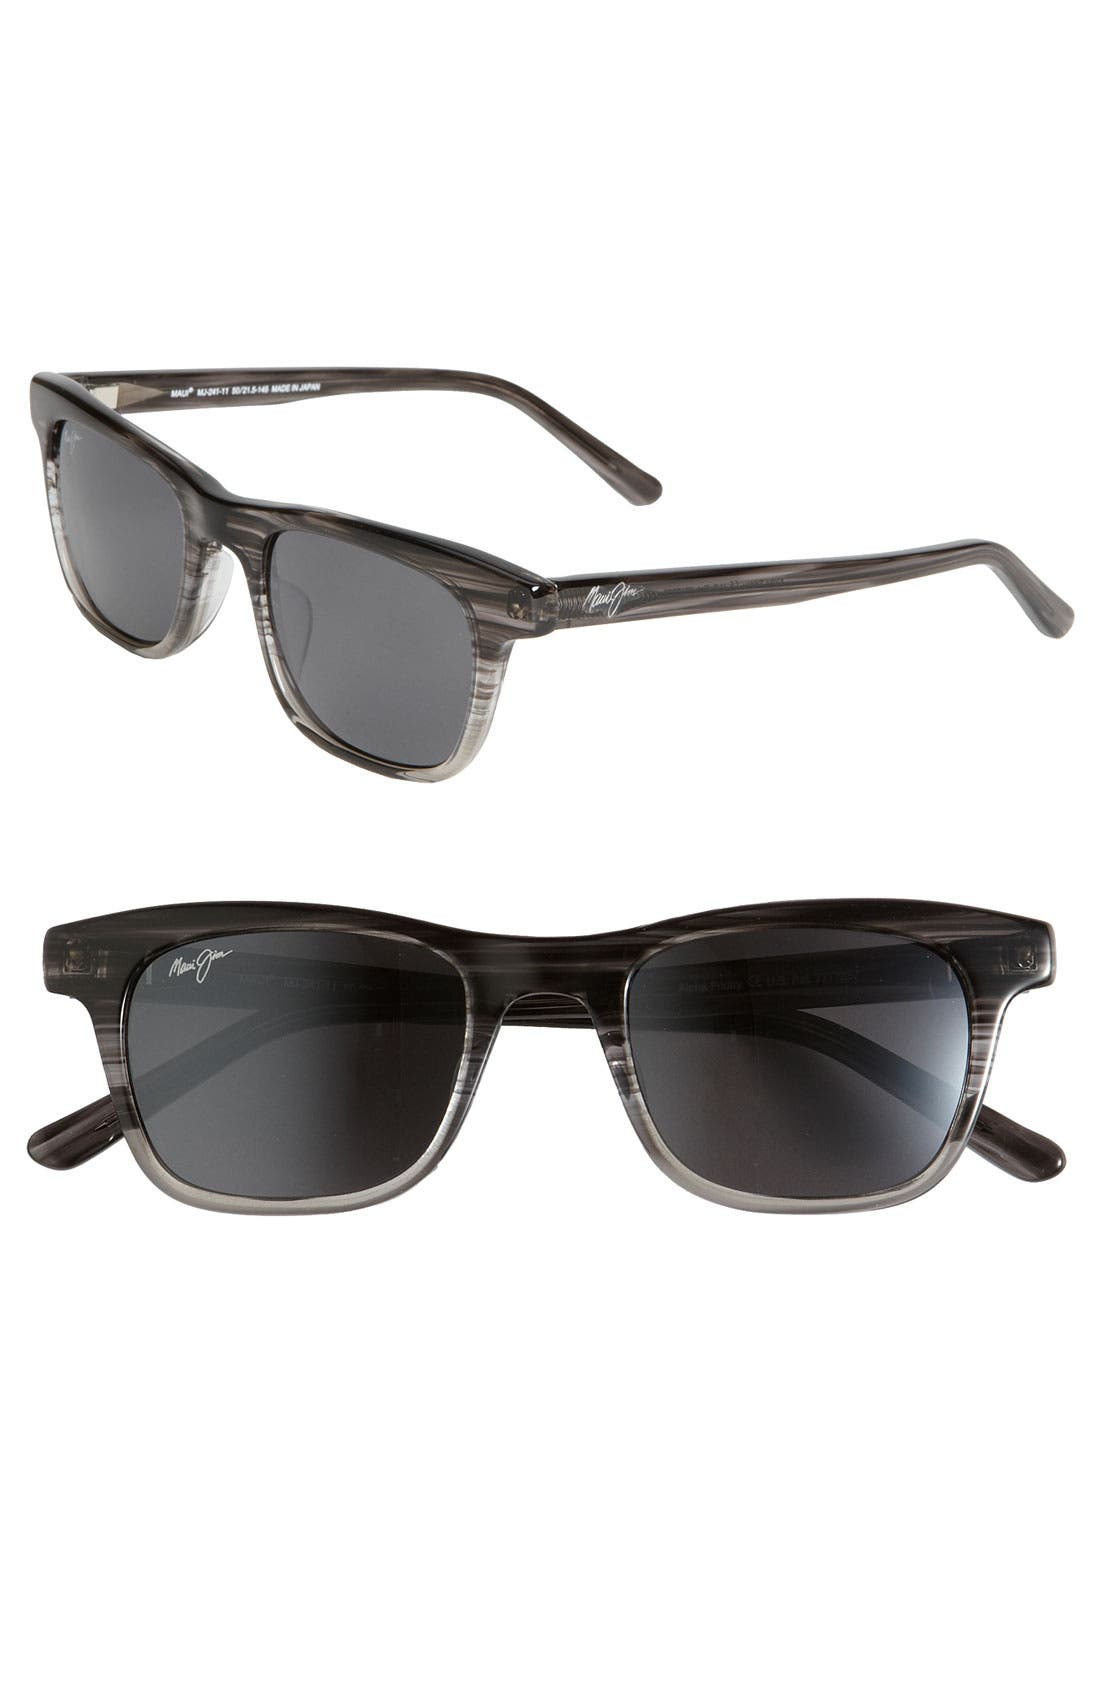 MAUI JIM,                             'Aloha Friday - PolarizedPlus<sup>®</sup>2' Retro Inspired Sunglasses,                             Main thumbnail 1, color,                             020